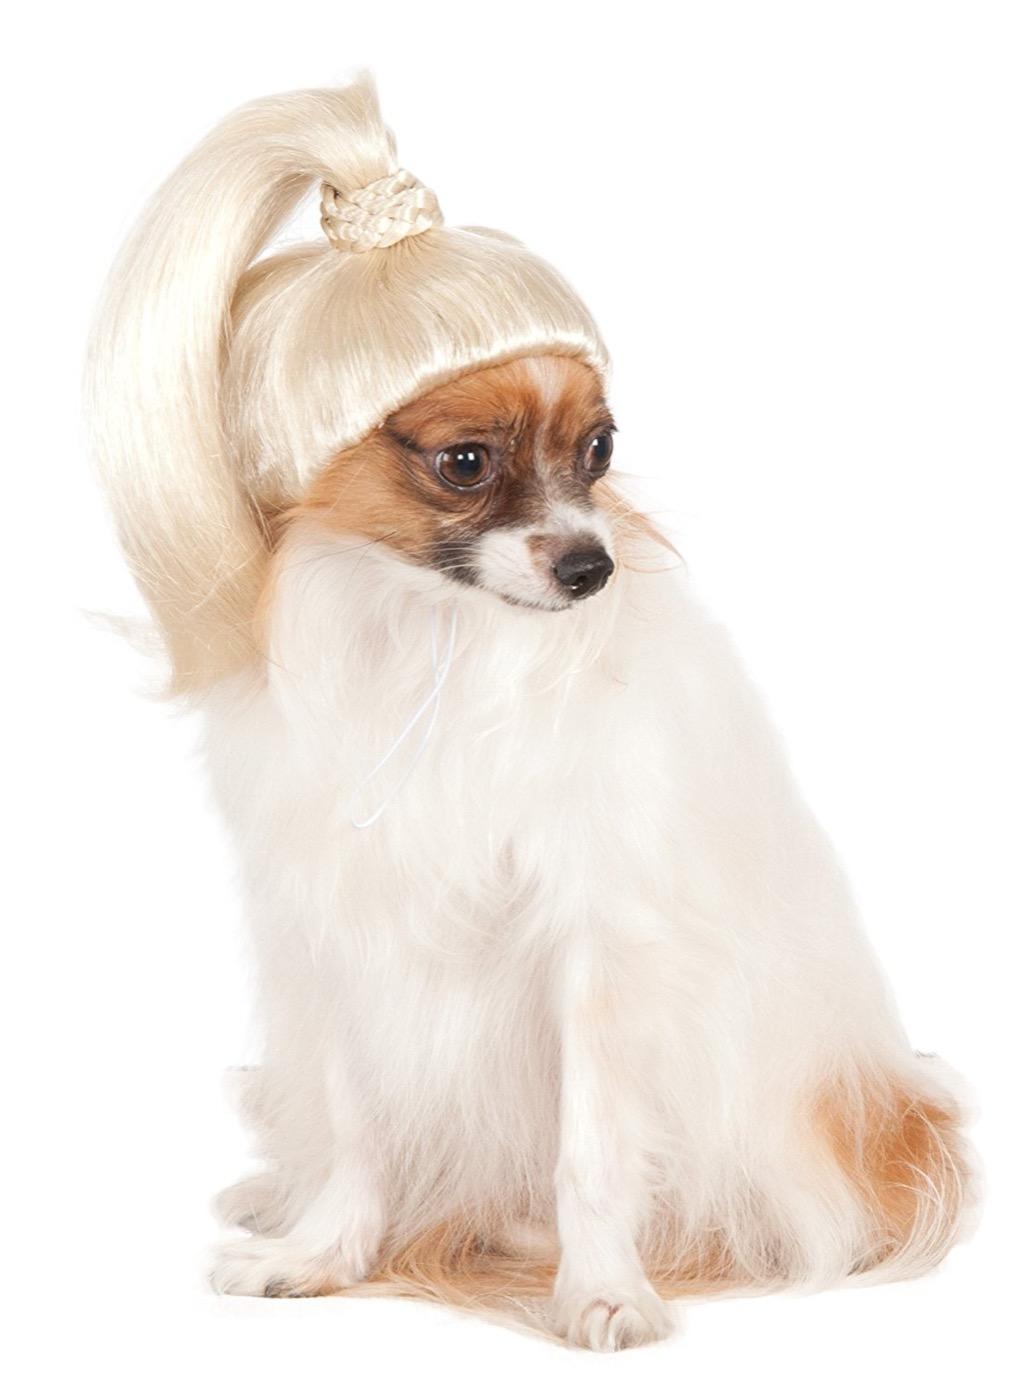 dog ponytail craziest Amazon products